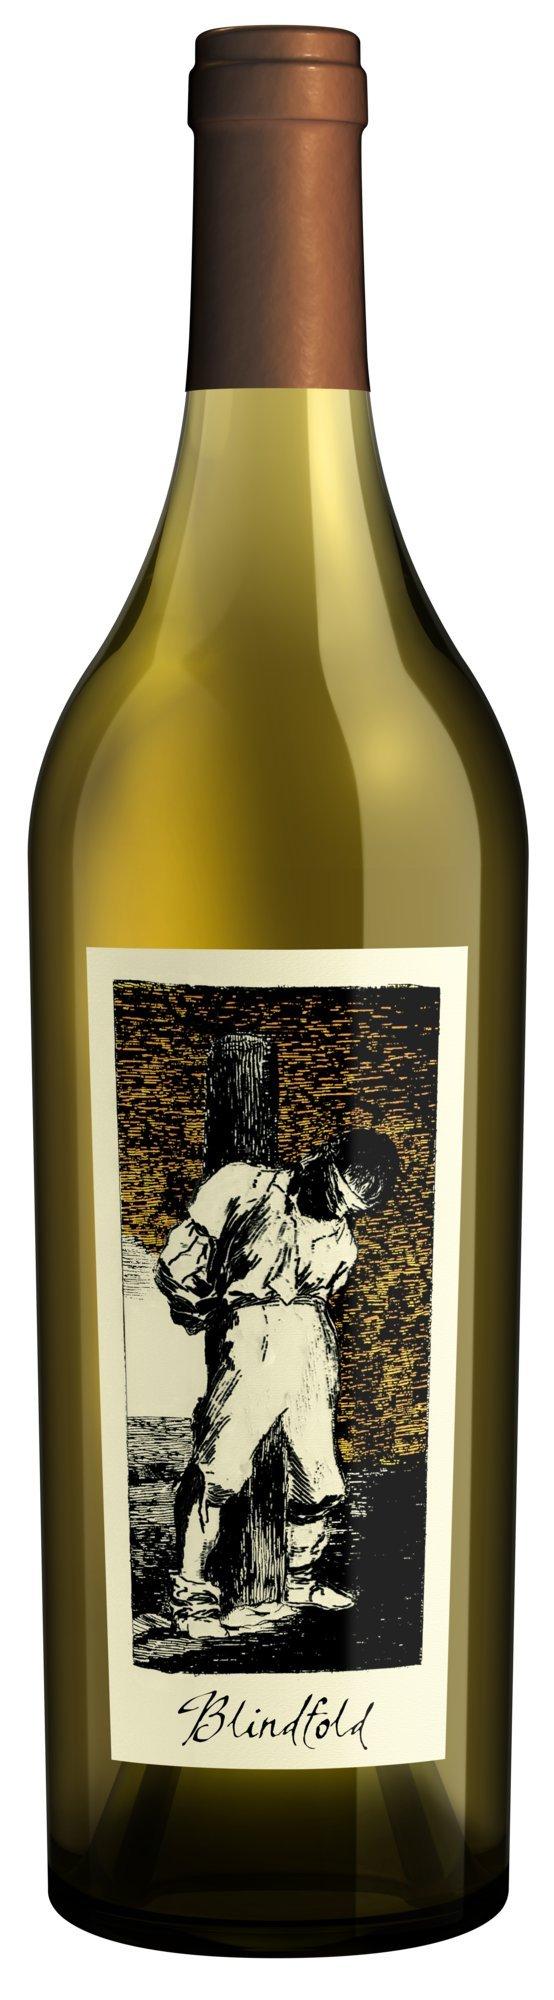 The-Prisoner-Wine-Company-Blindfold-2016-750ml-1420